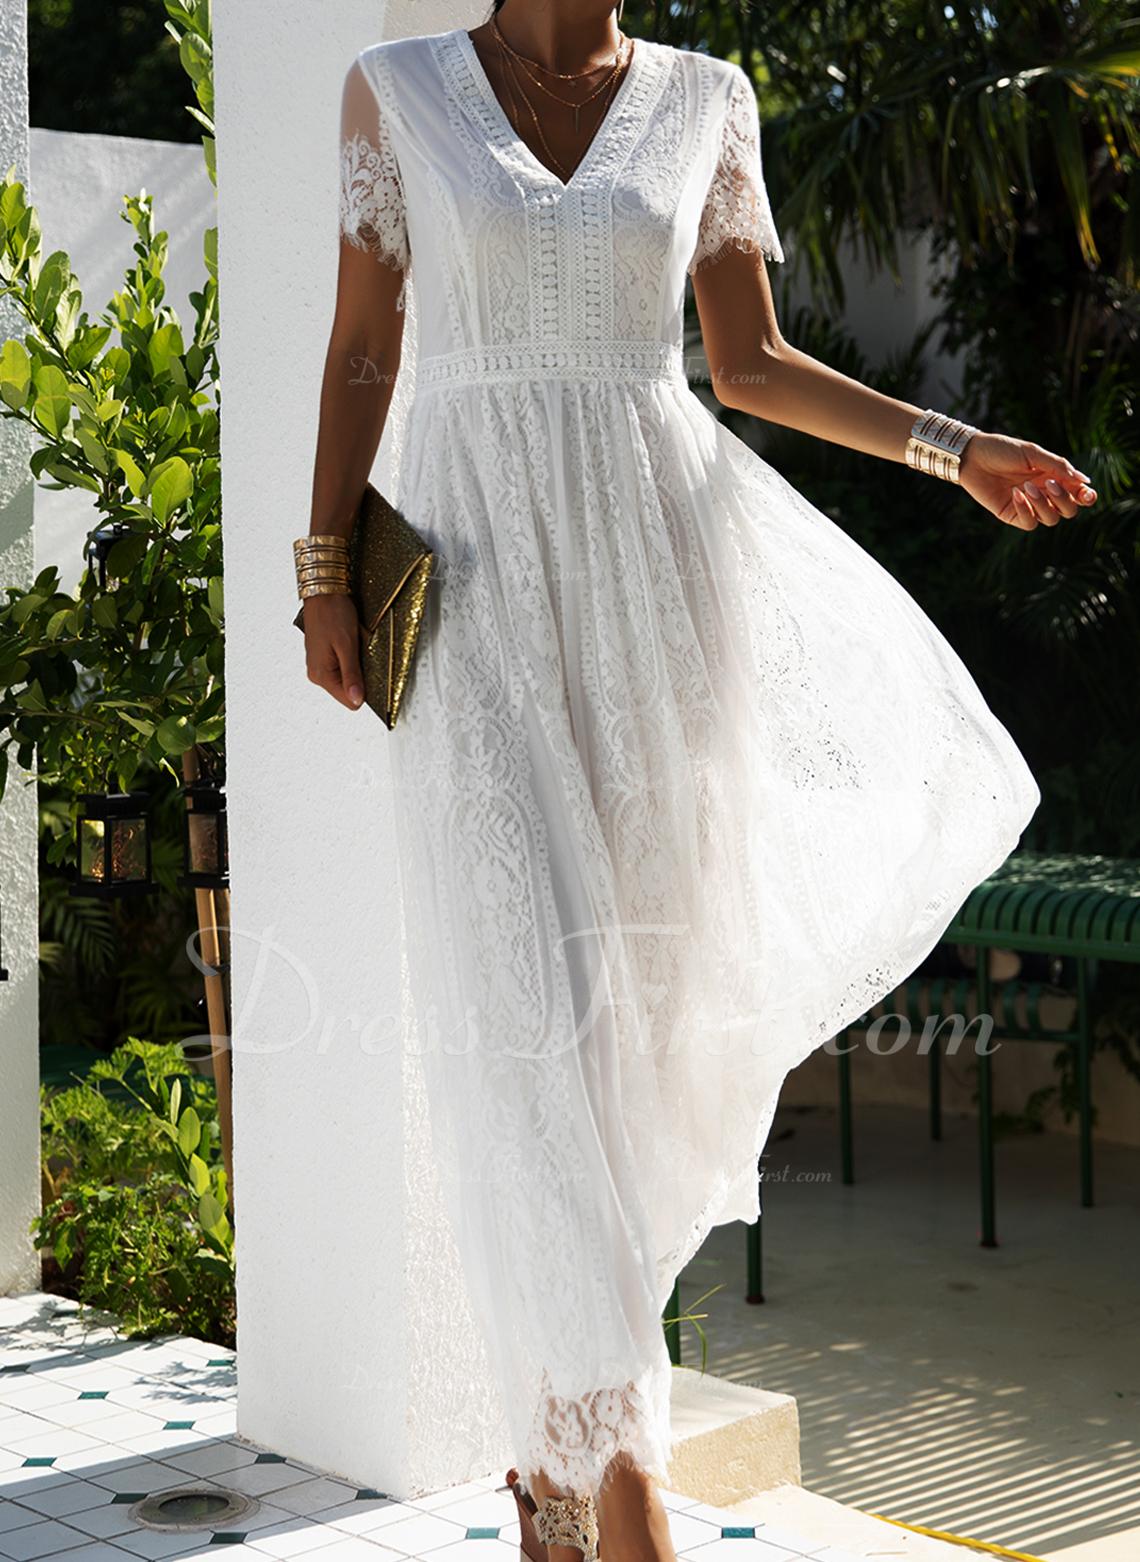 Dantel Solid Bir Çizgi Mâneci Scurte Maxi Zarif Patenci Moda Elbiseler